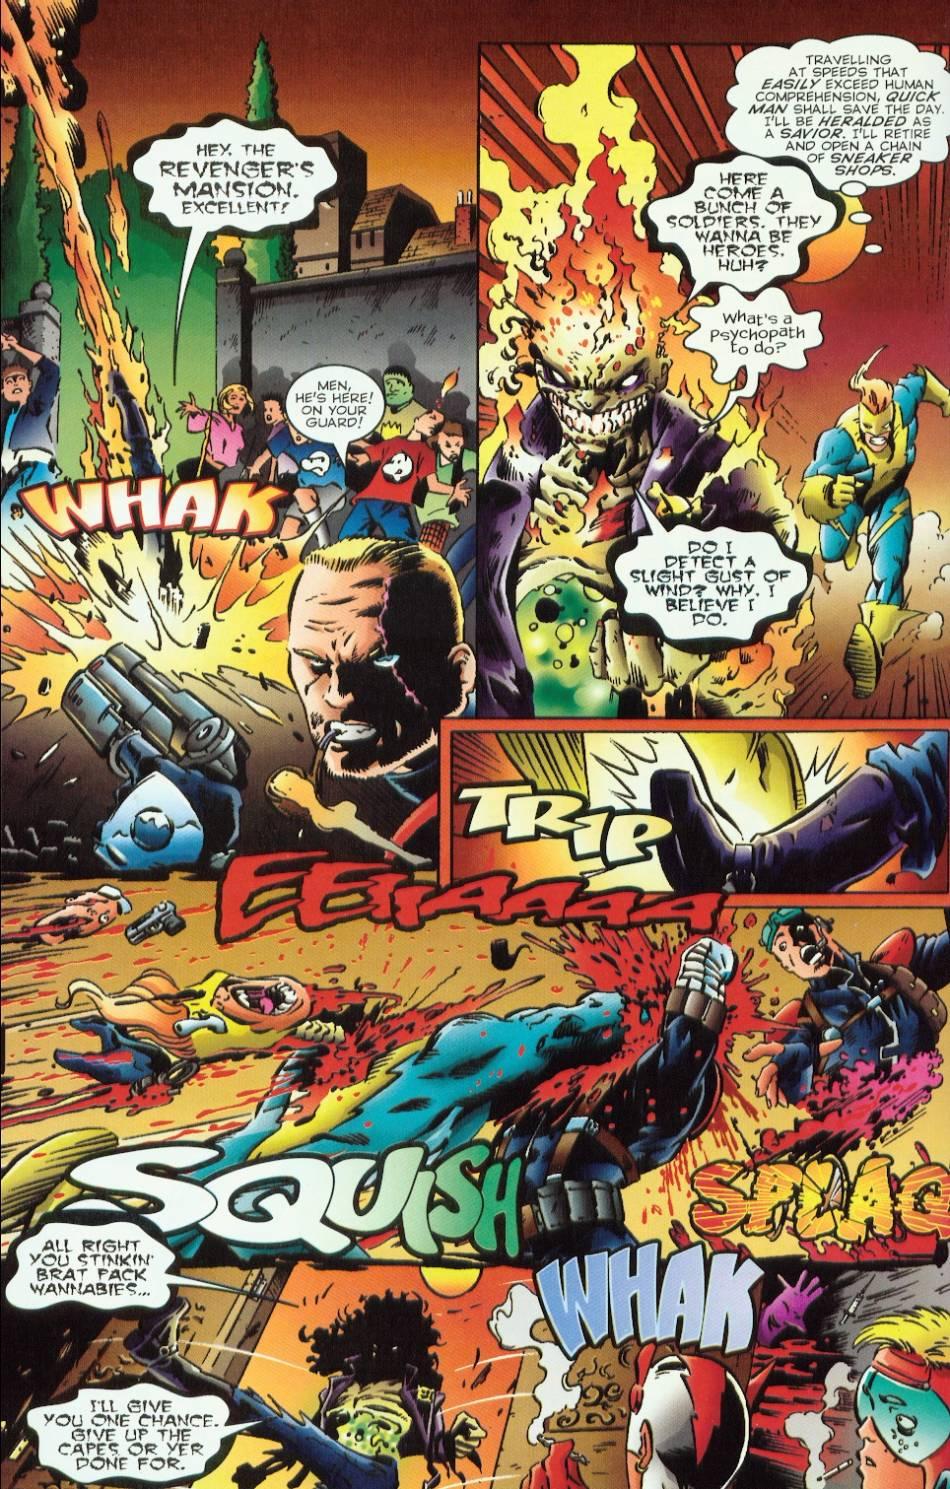 Read online Evil Ernie vs. the Superheroes comic -  Issue #1 - 20